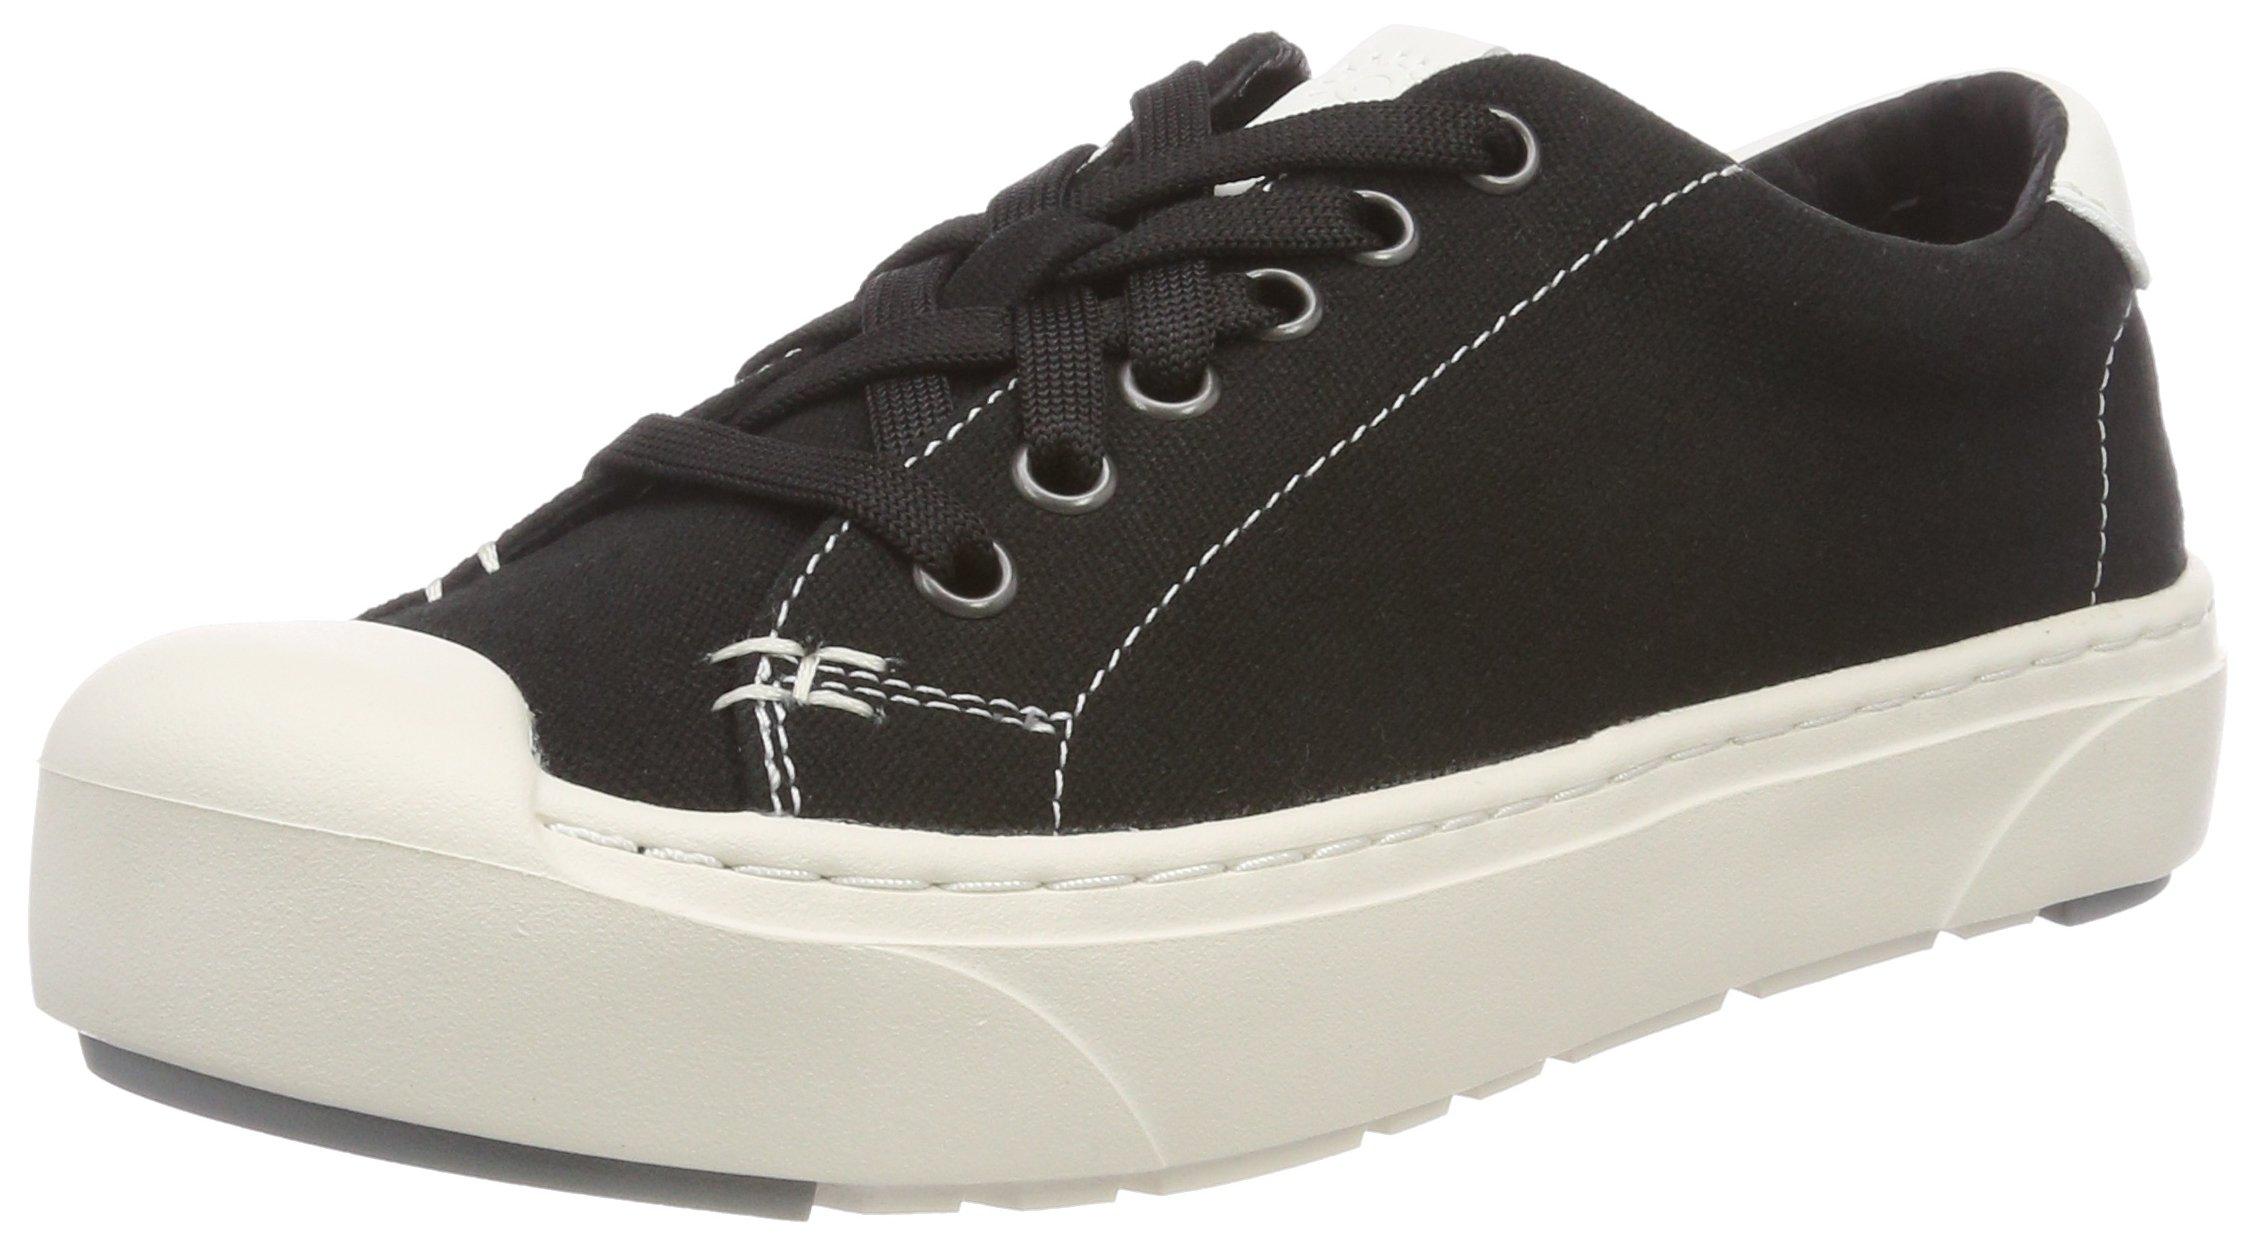 5103010 FemmeNoirschwarz Eu 4141 Heybrid DensitySneakers Basses Sneaker High HIEDY2W9